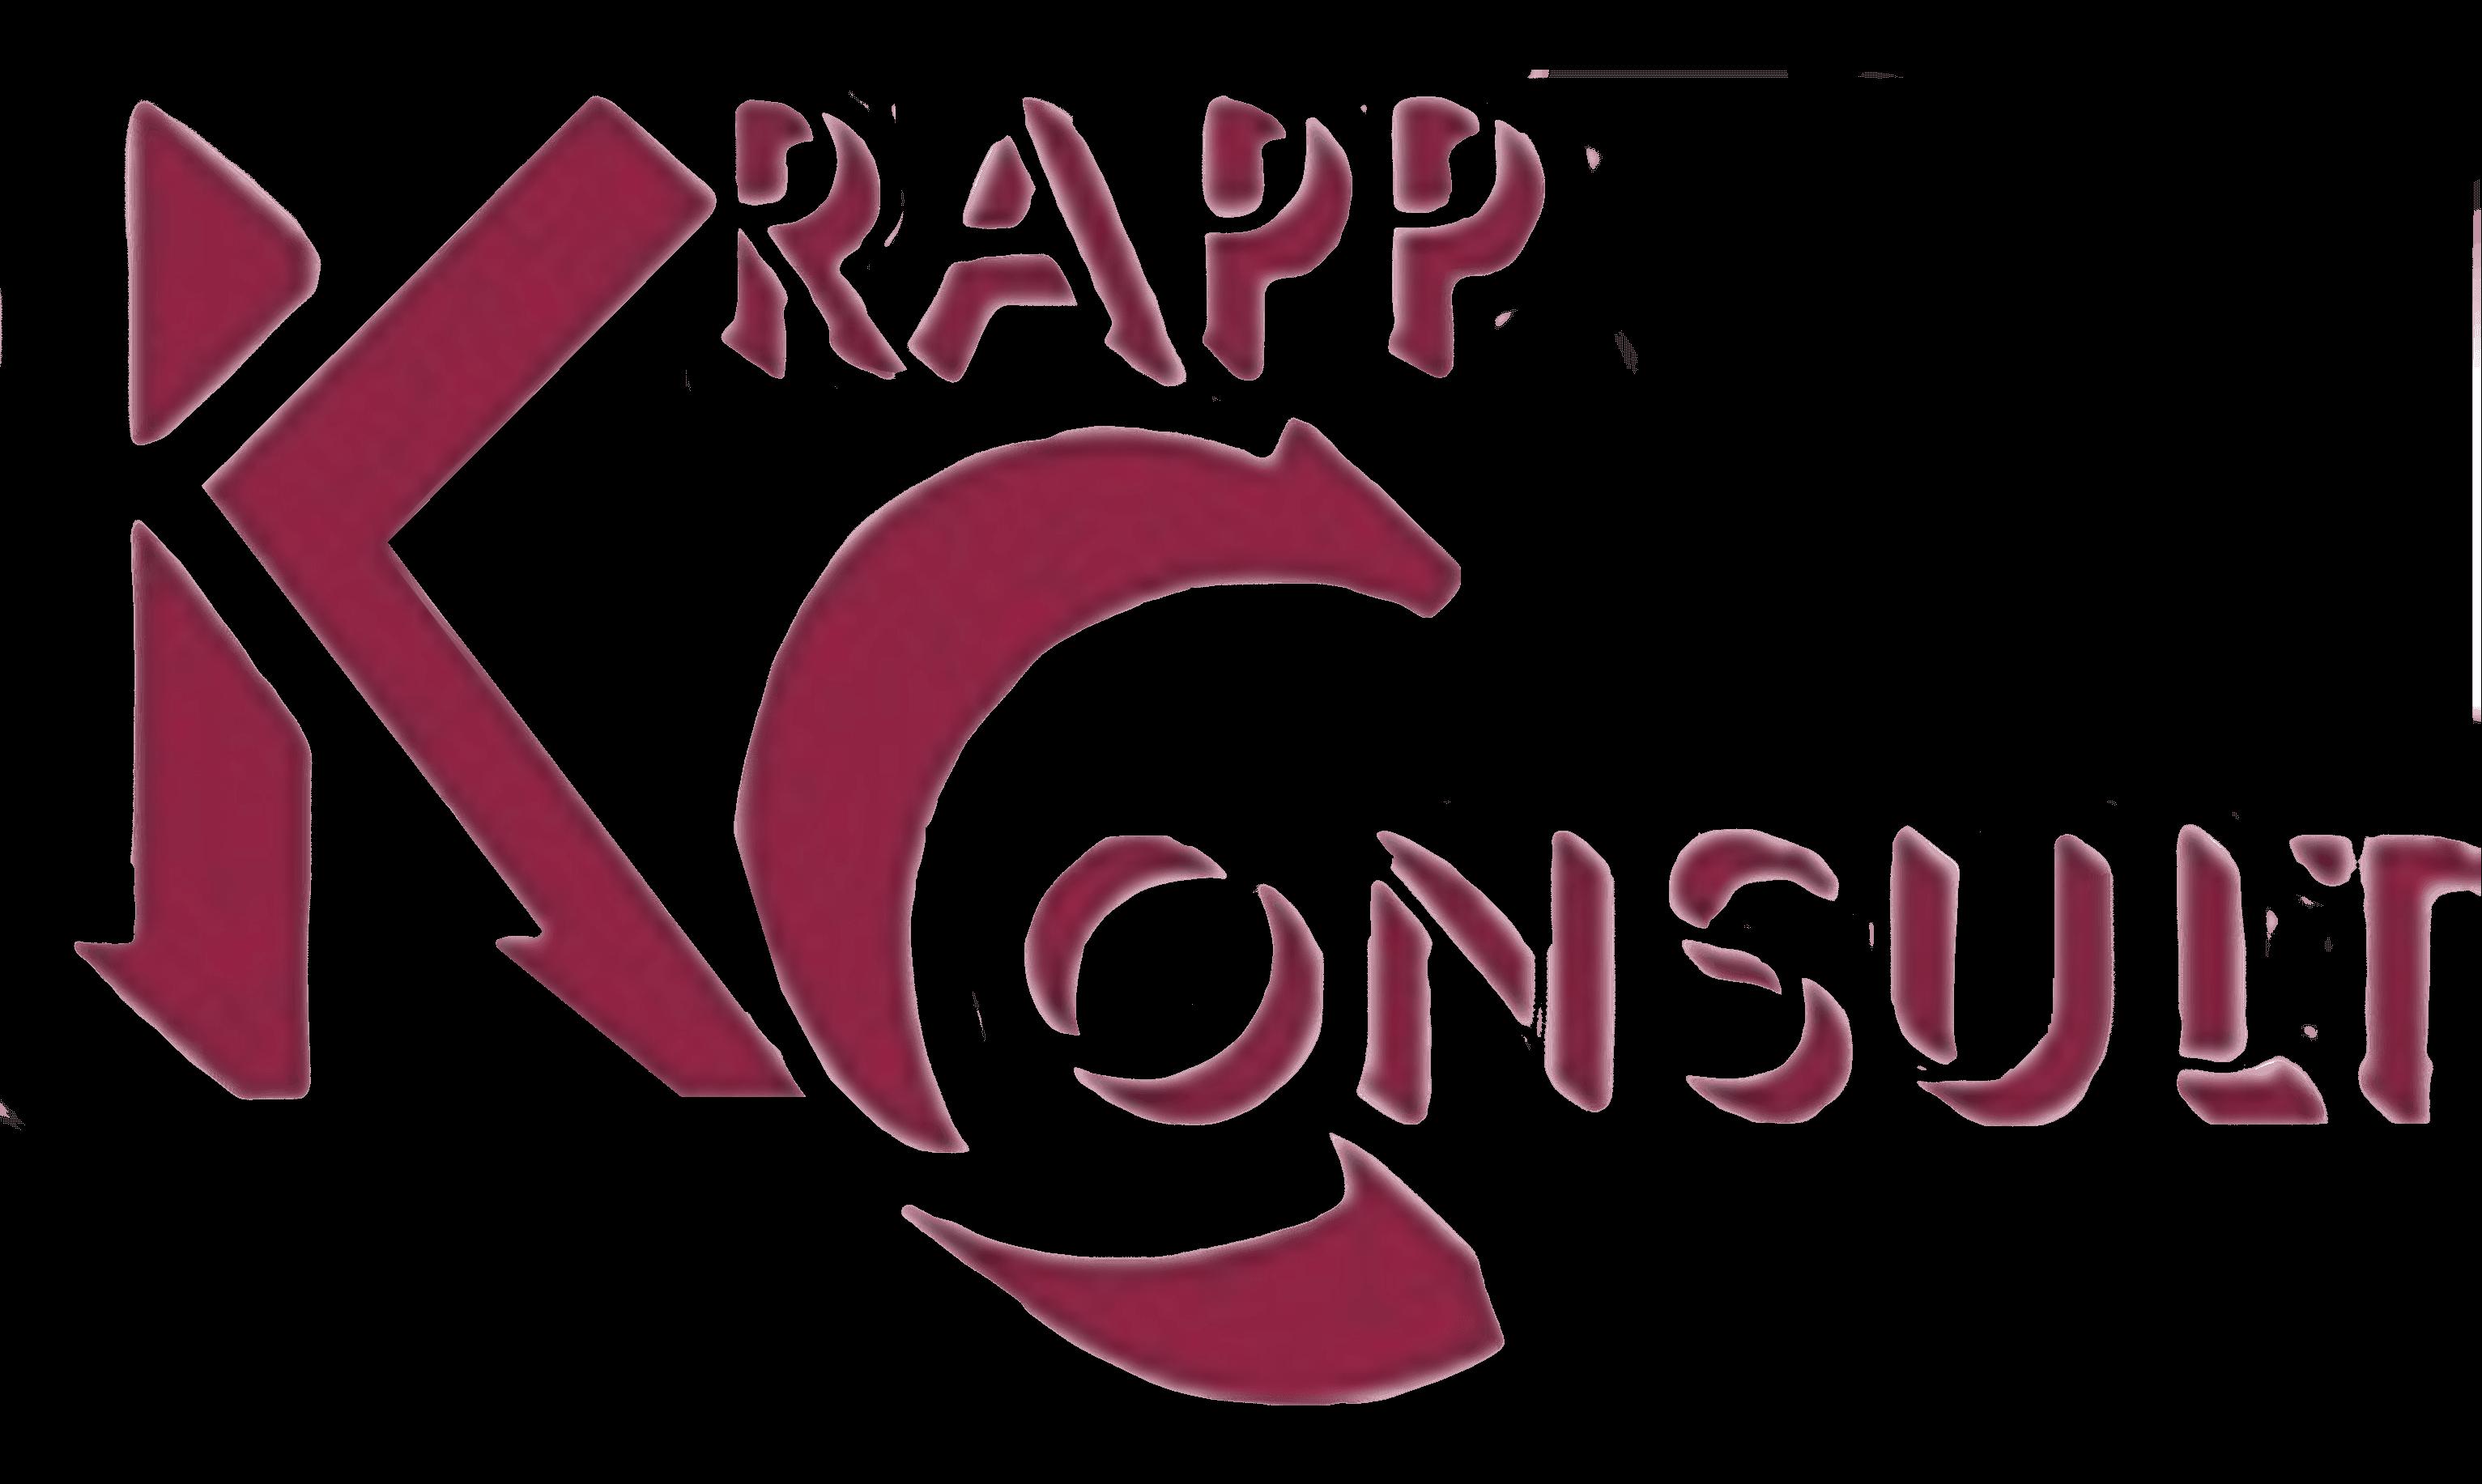 Krapp Consult Unternehmensberatung